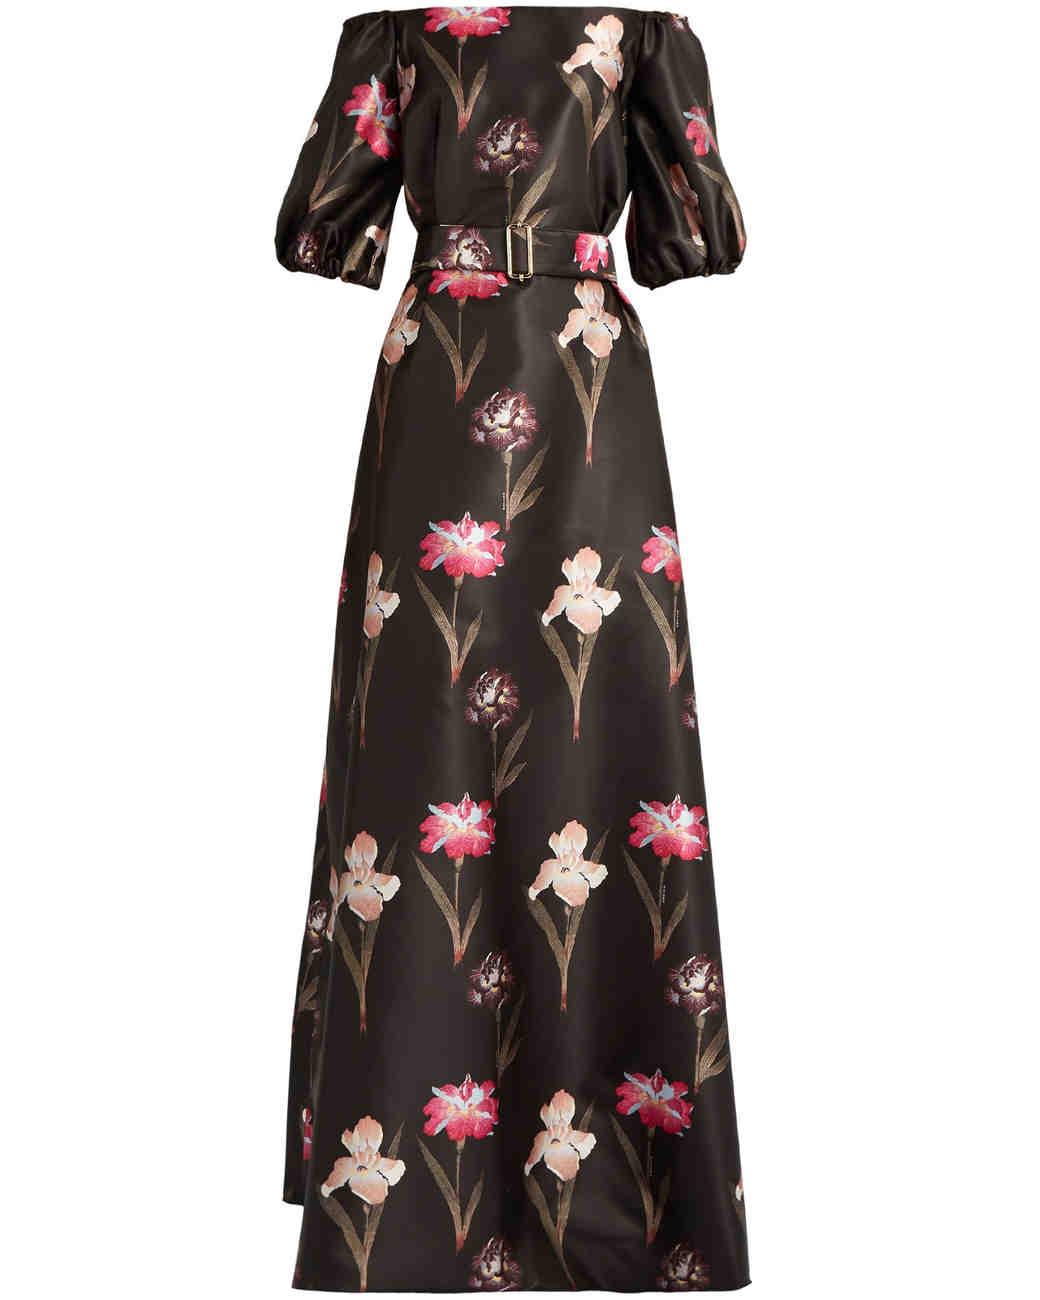 Black Satin Floral Print Gown